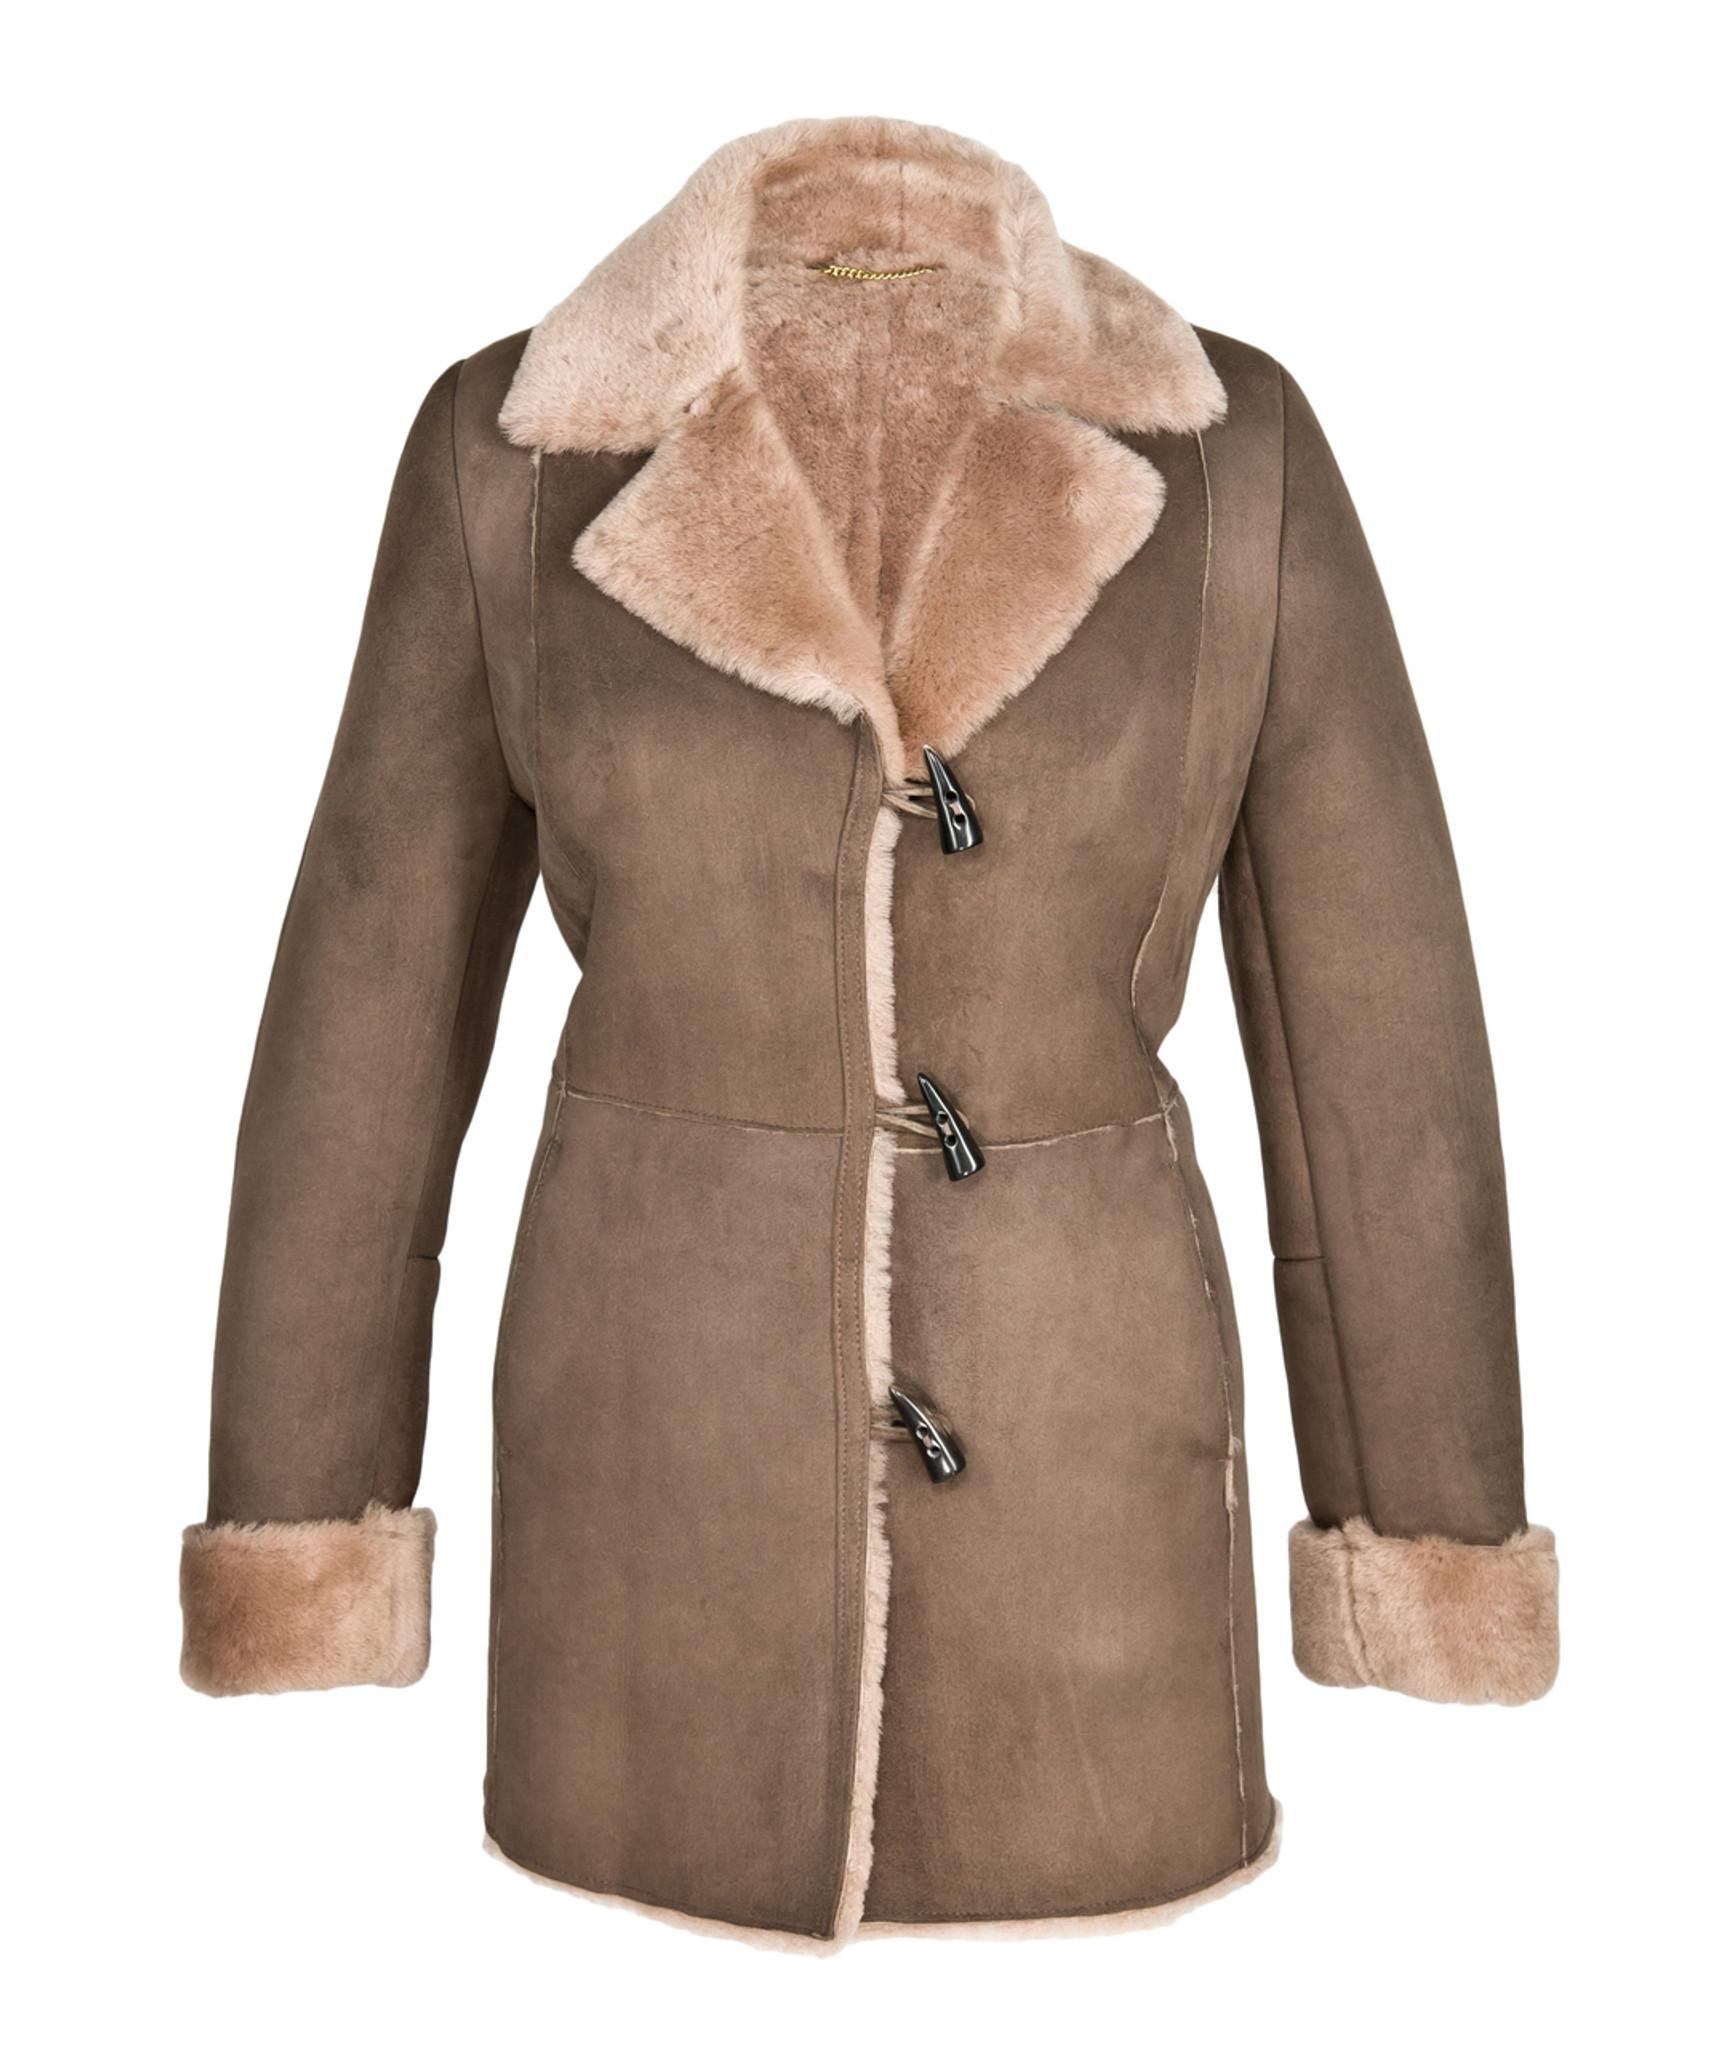 618089321d Anna Sheepskin Coat For Women - Cool Sheepskin UK